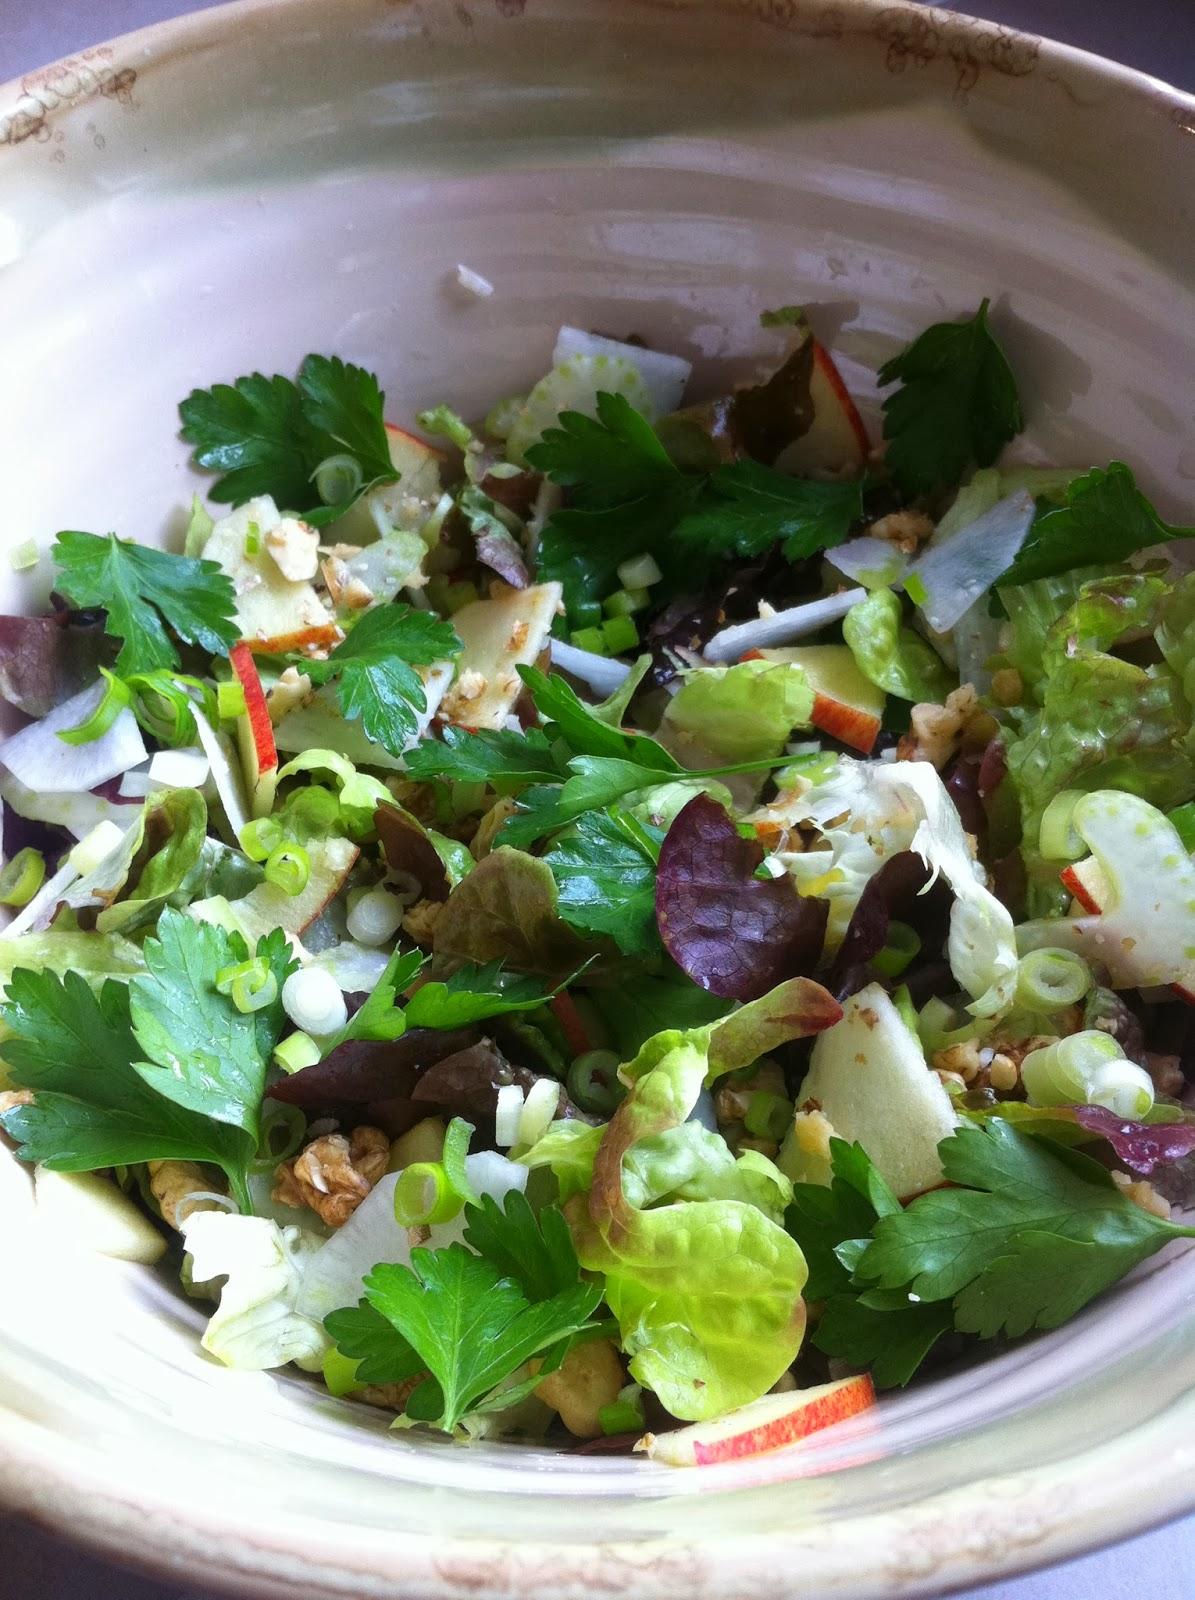 june and jess recette 7 salade croquante detox de printemps. Black Bedroom Furniture Sets. Home Design Ideas